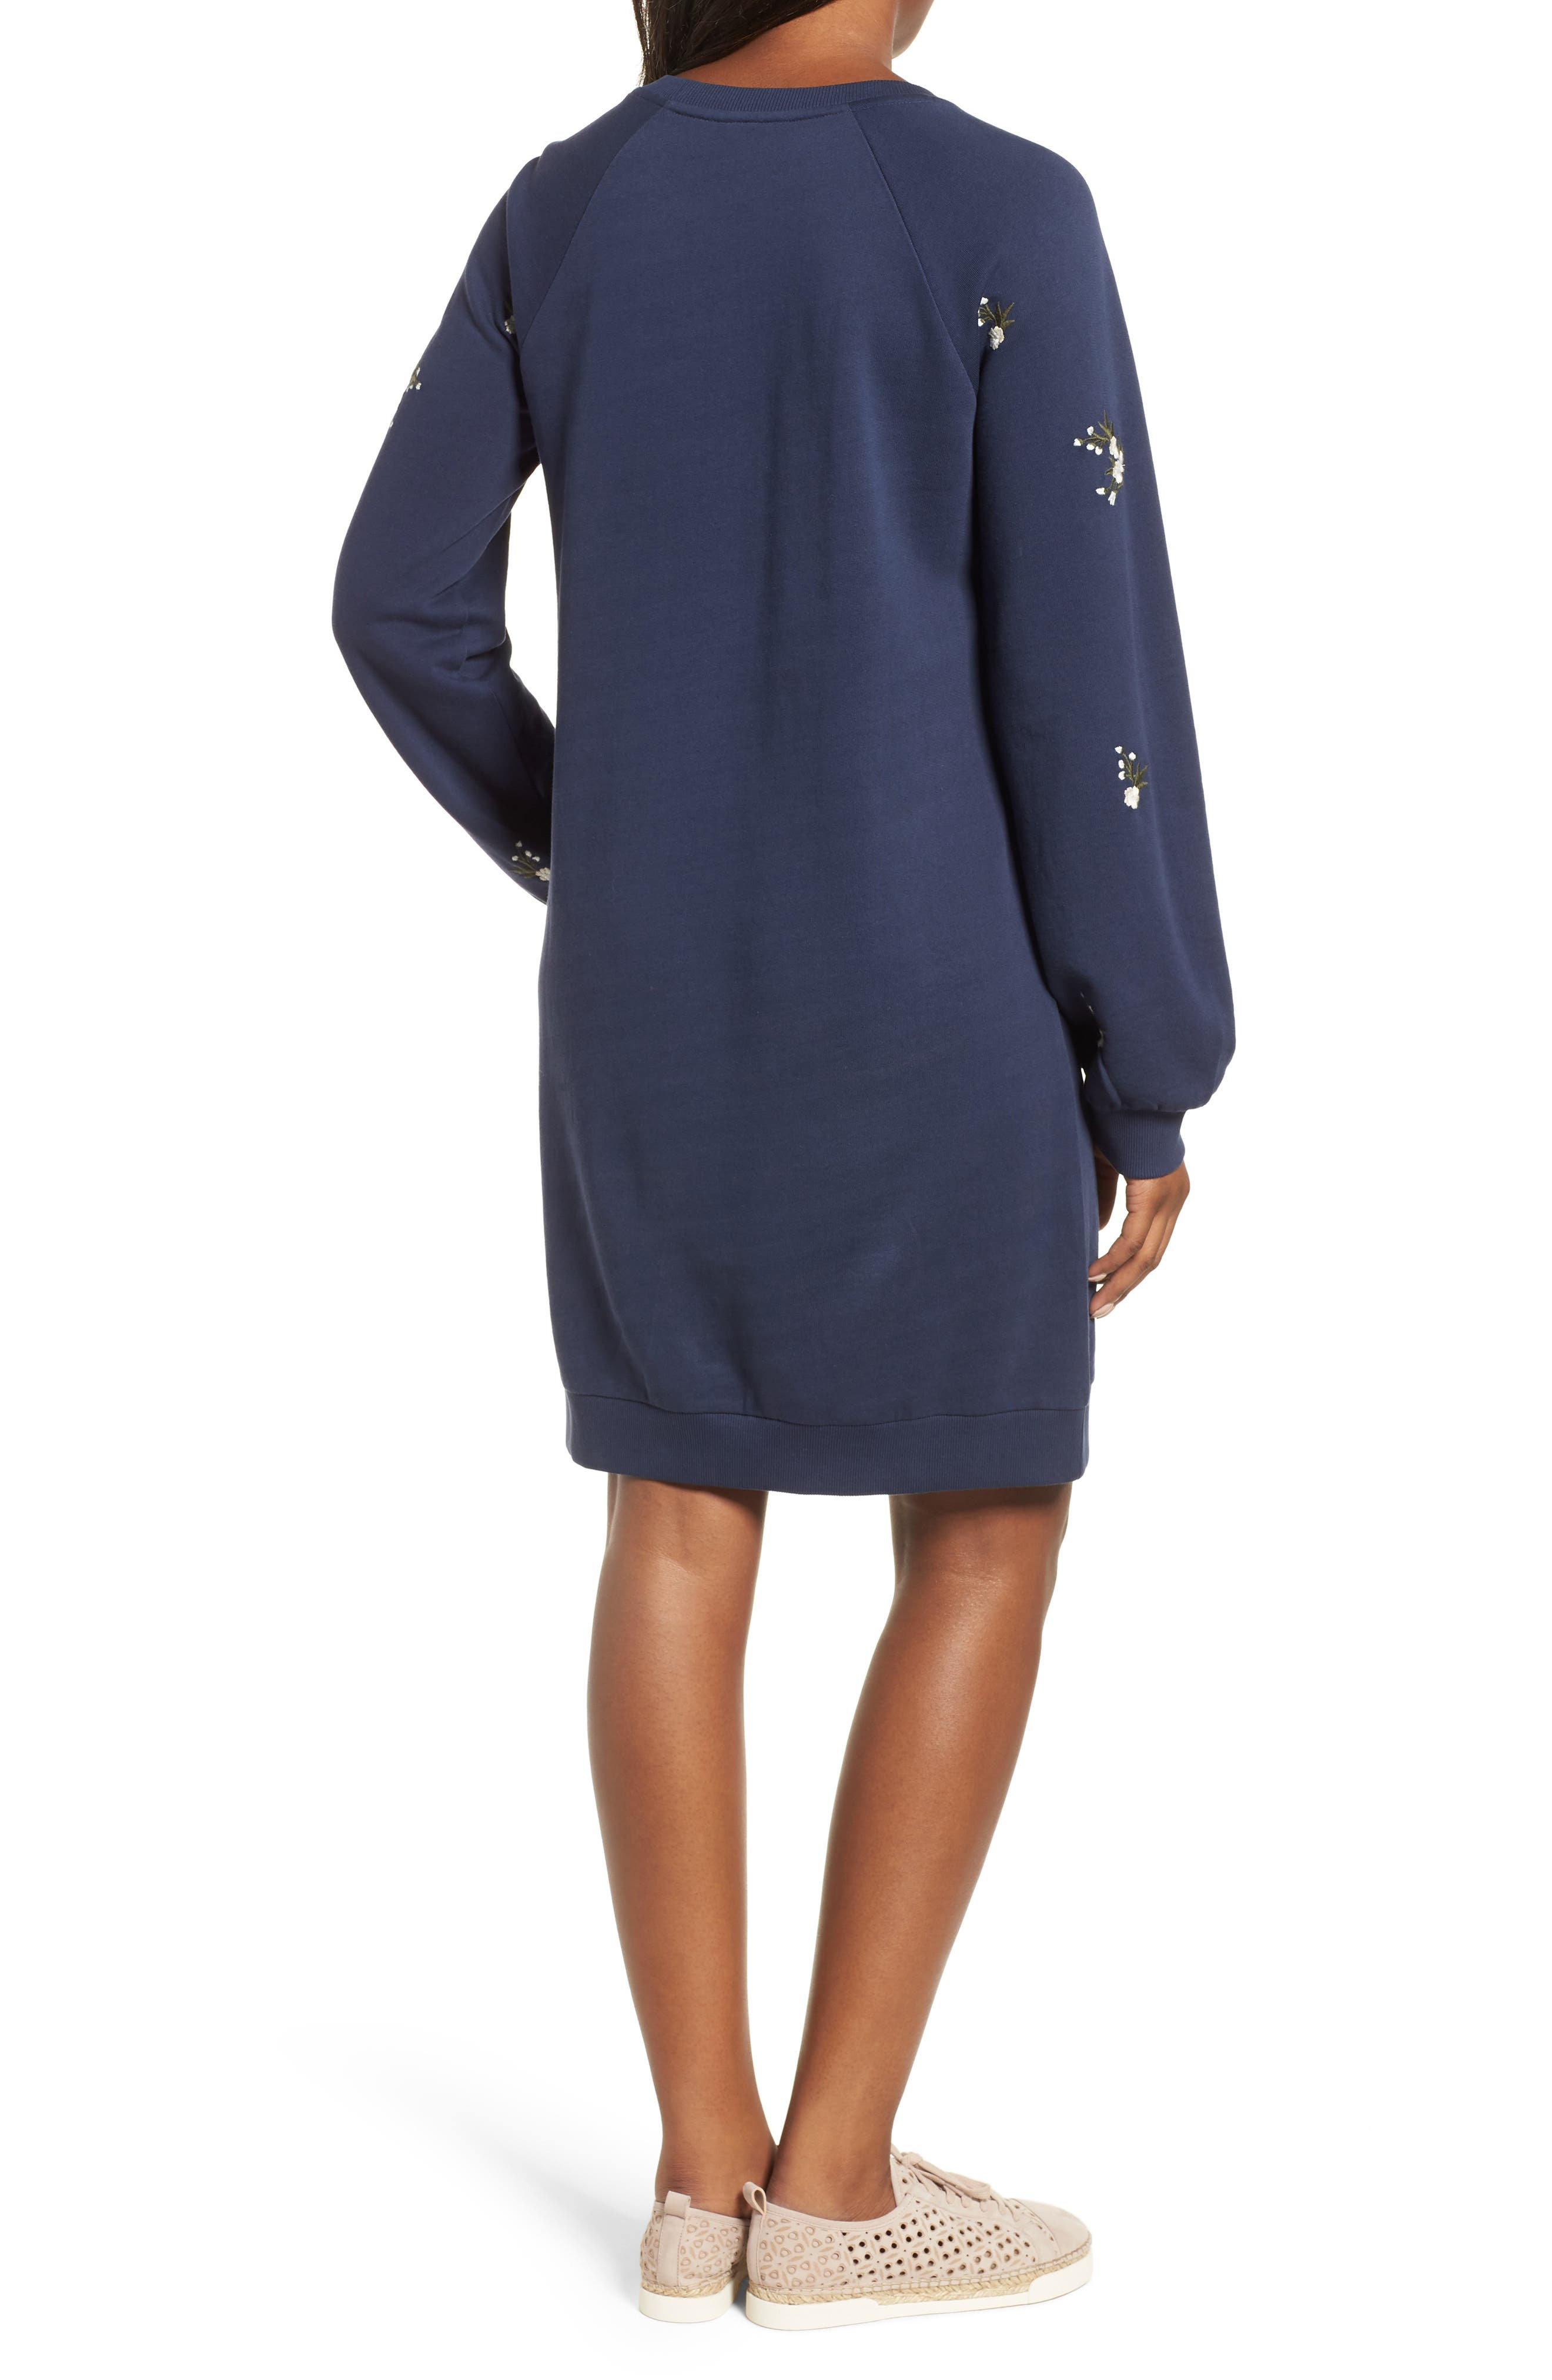 Embroidered Sweatshirt Dress,                             Alternate thumbnail 2, color,                             NAVY INDIGO GAYLE EMB